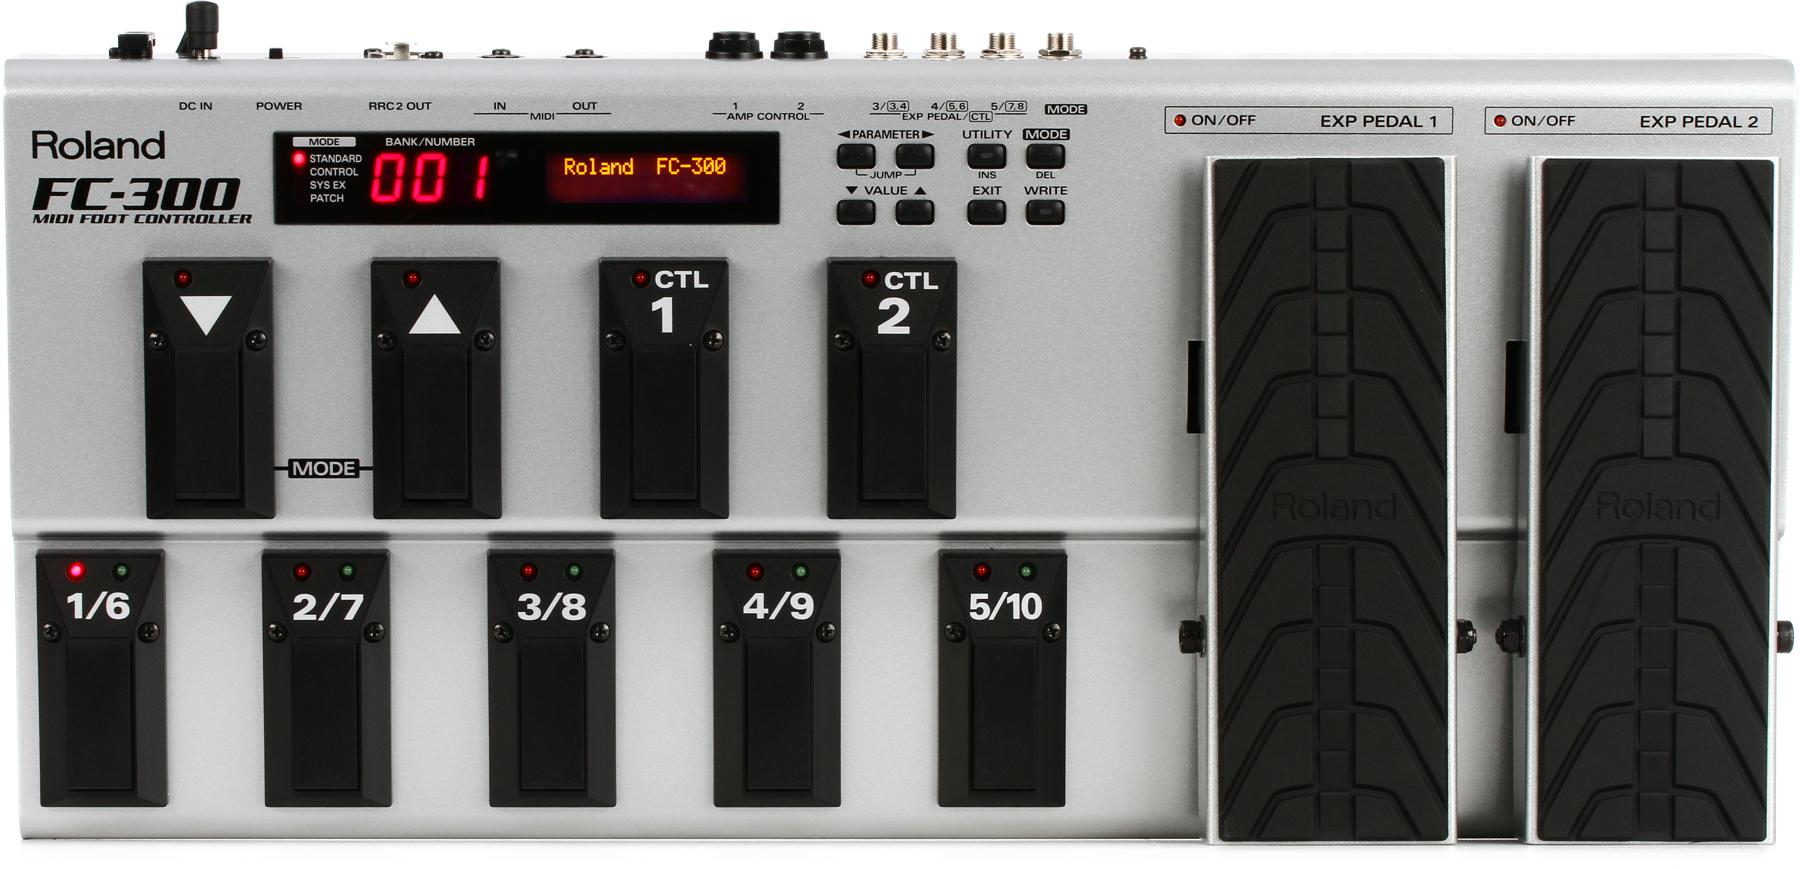 6. Roland FC-300 MIDI Foot Controller